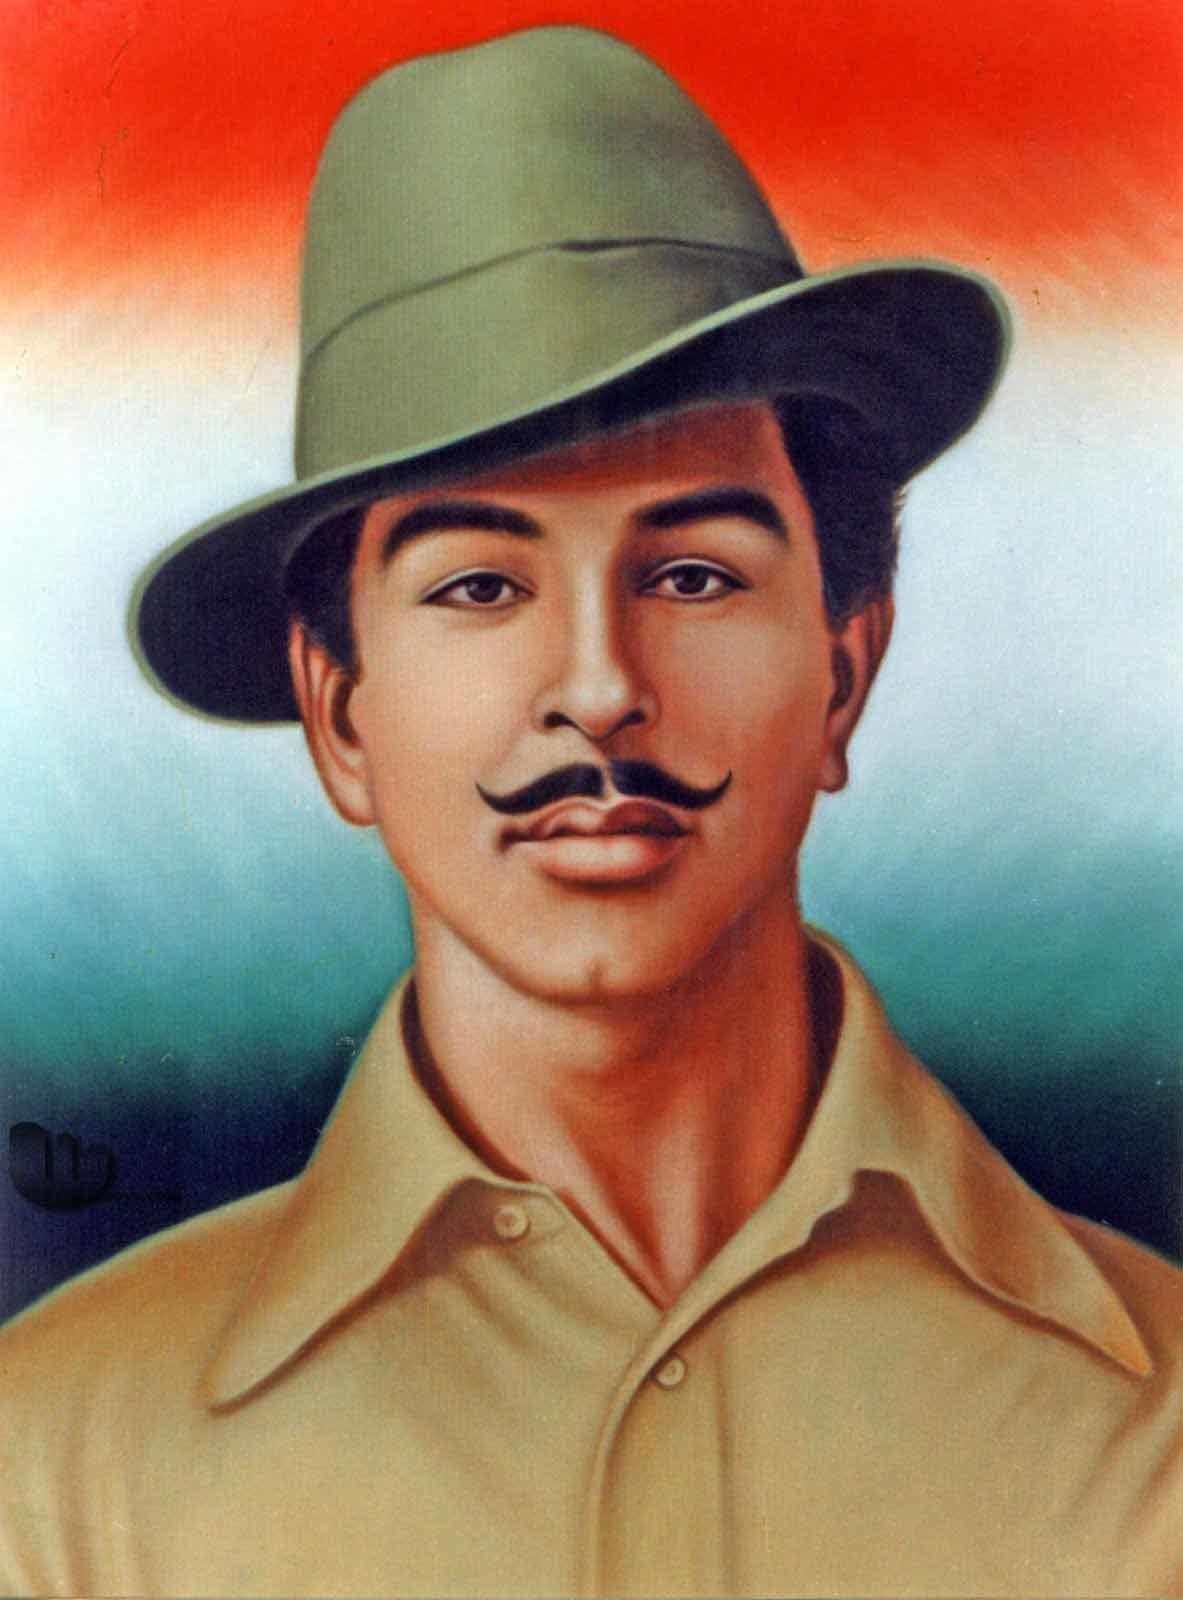 Bhagat Singh Wallpaper Hd With Gun